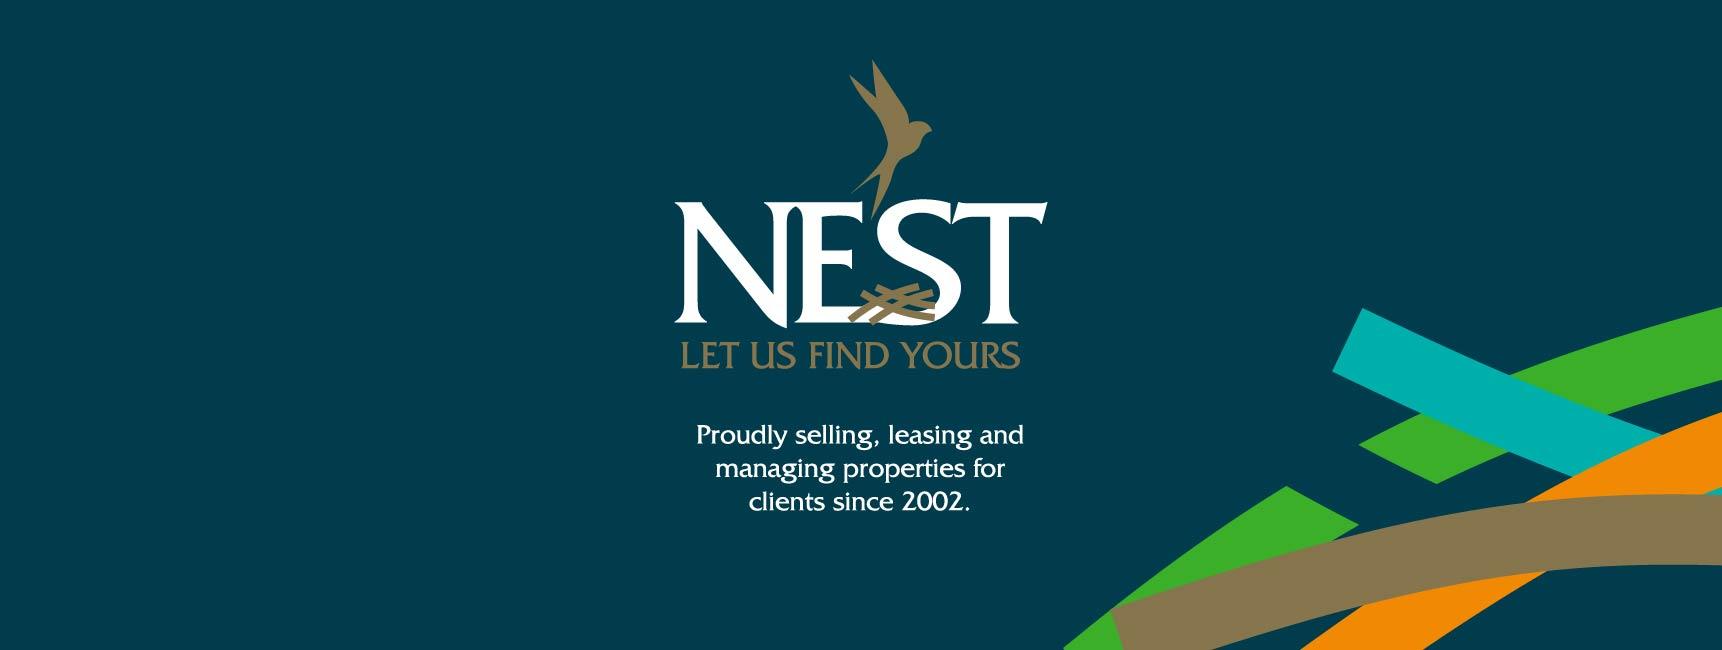 NEST-facebook-cover-2-copy-1